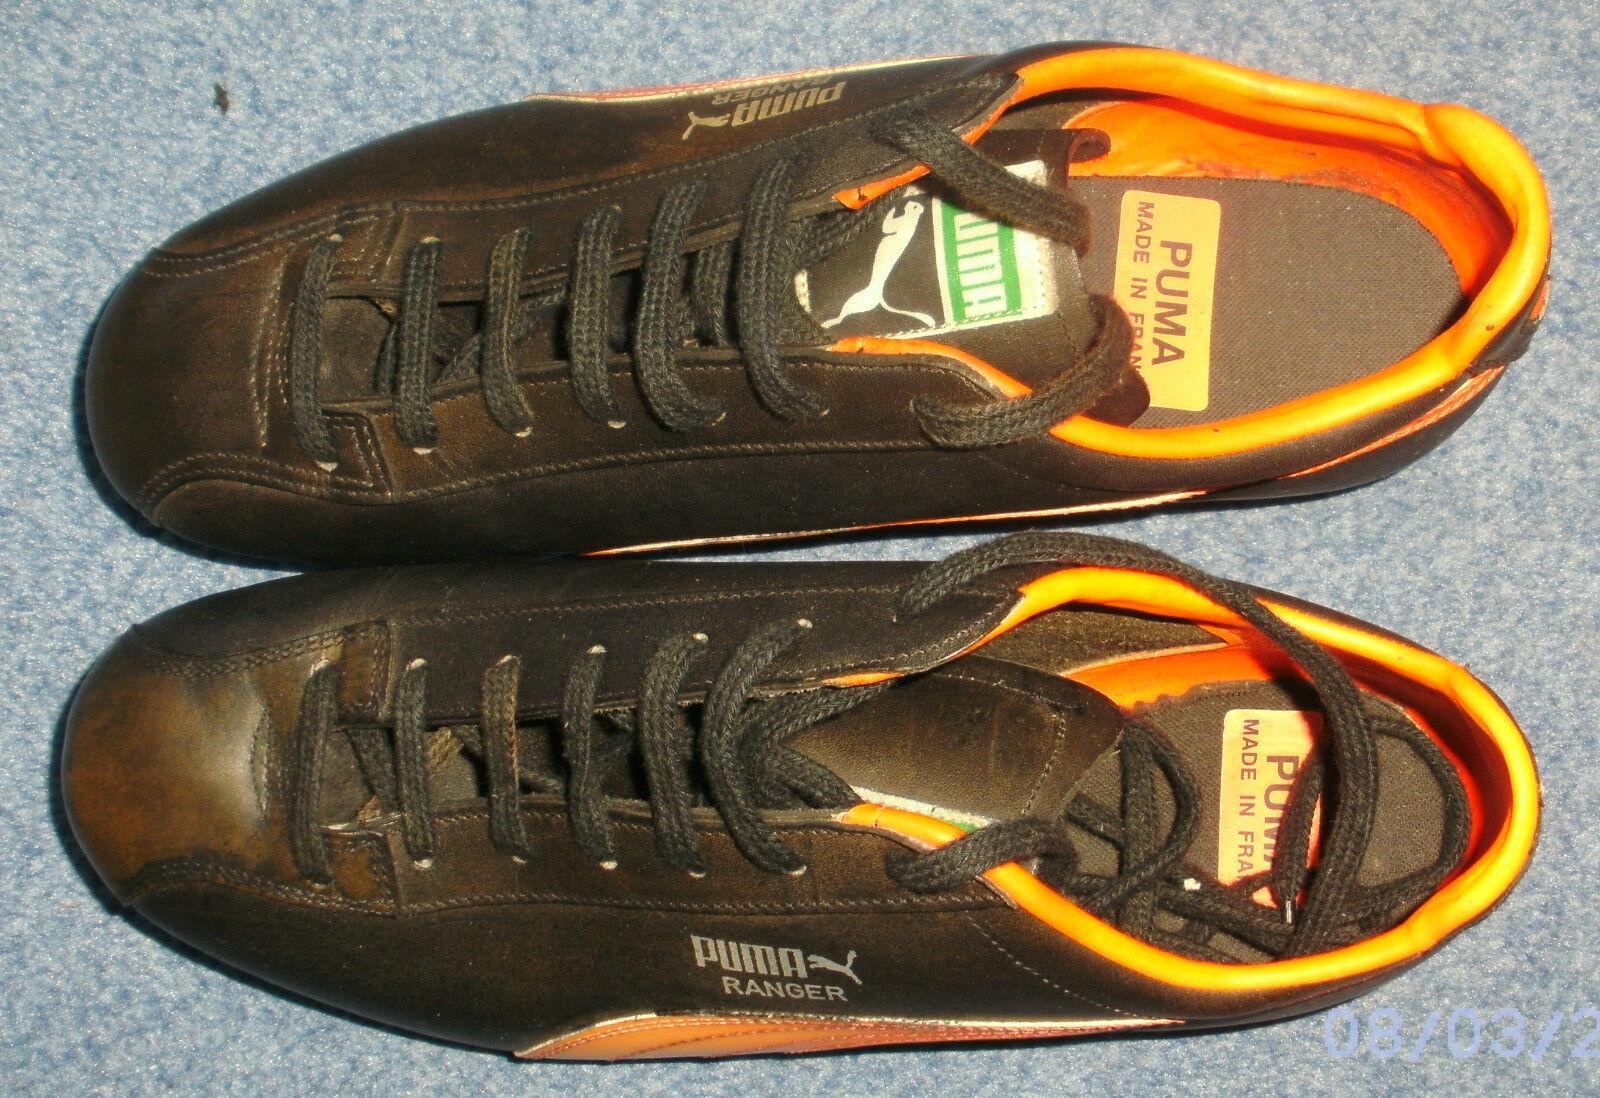 Seltene Vintage Puma Fußballschuhe FG Ranger FG Fußballschuhe 312, NEU, Gr. 40,5 = 7 62f54c